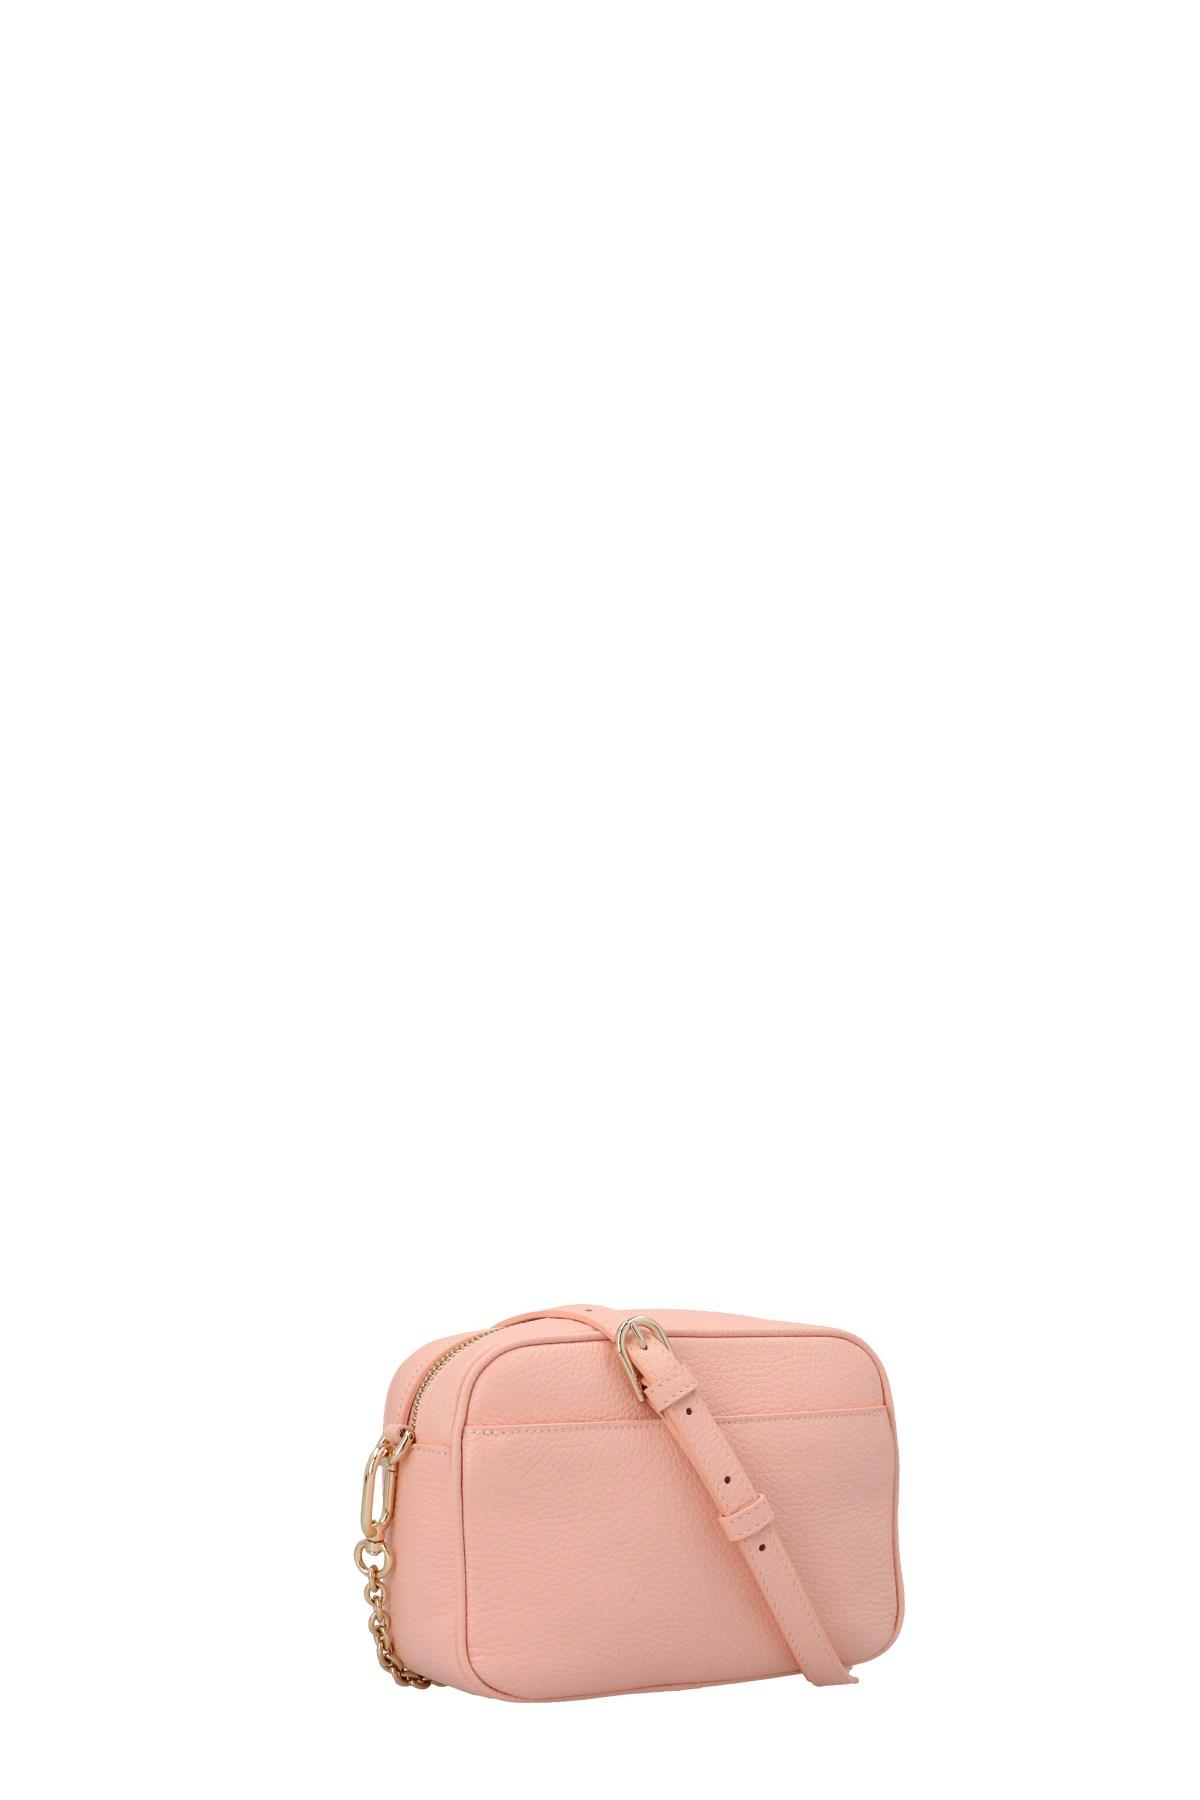 Furla Leather Real Mini Crossbody Bag in Black - Lyst